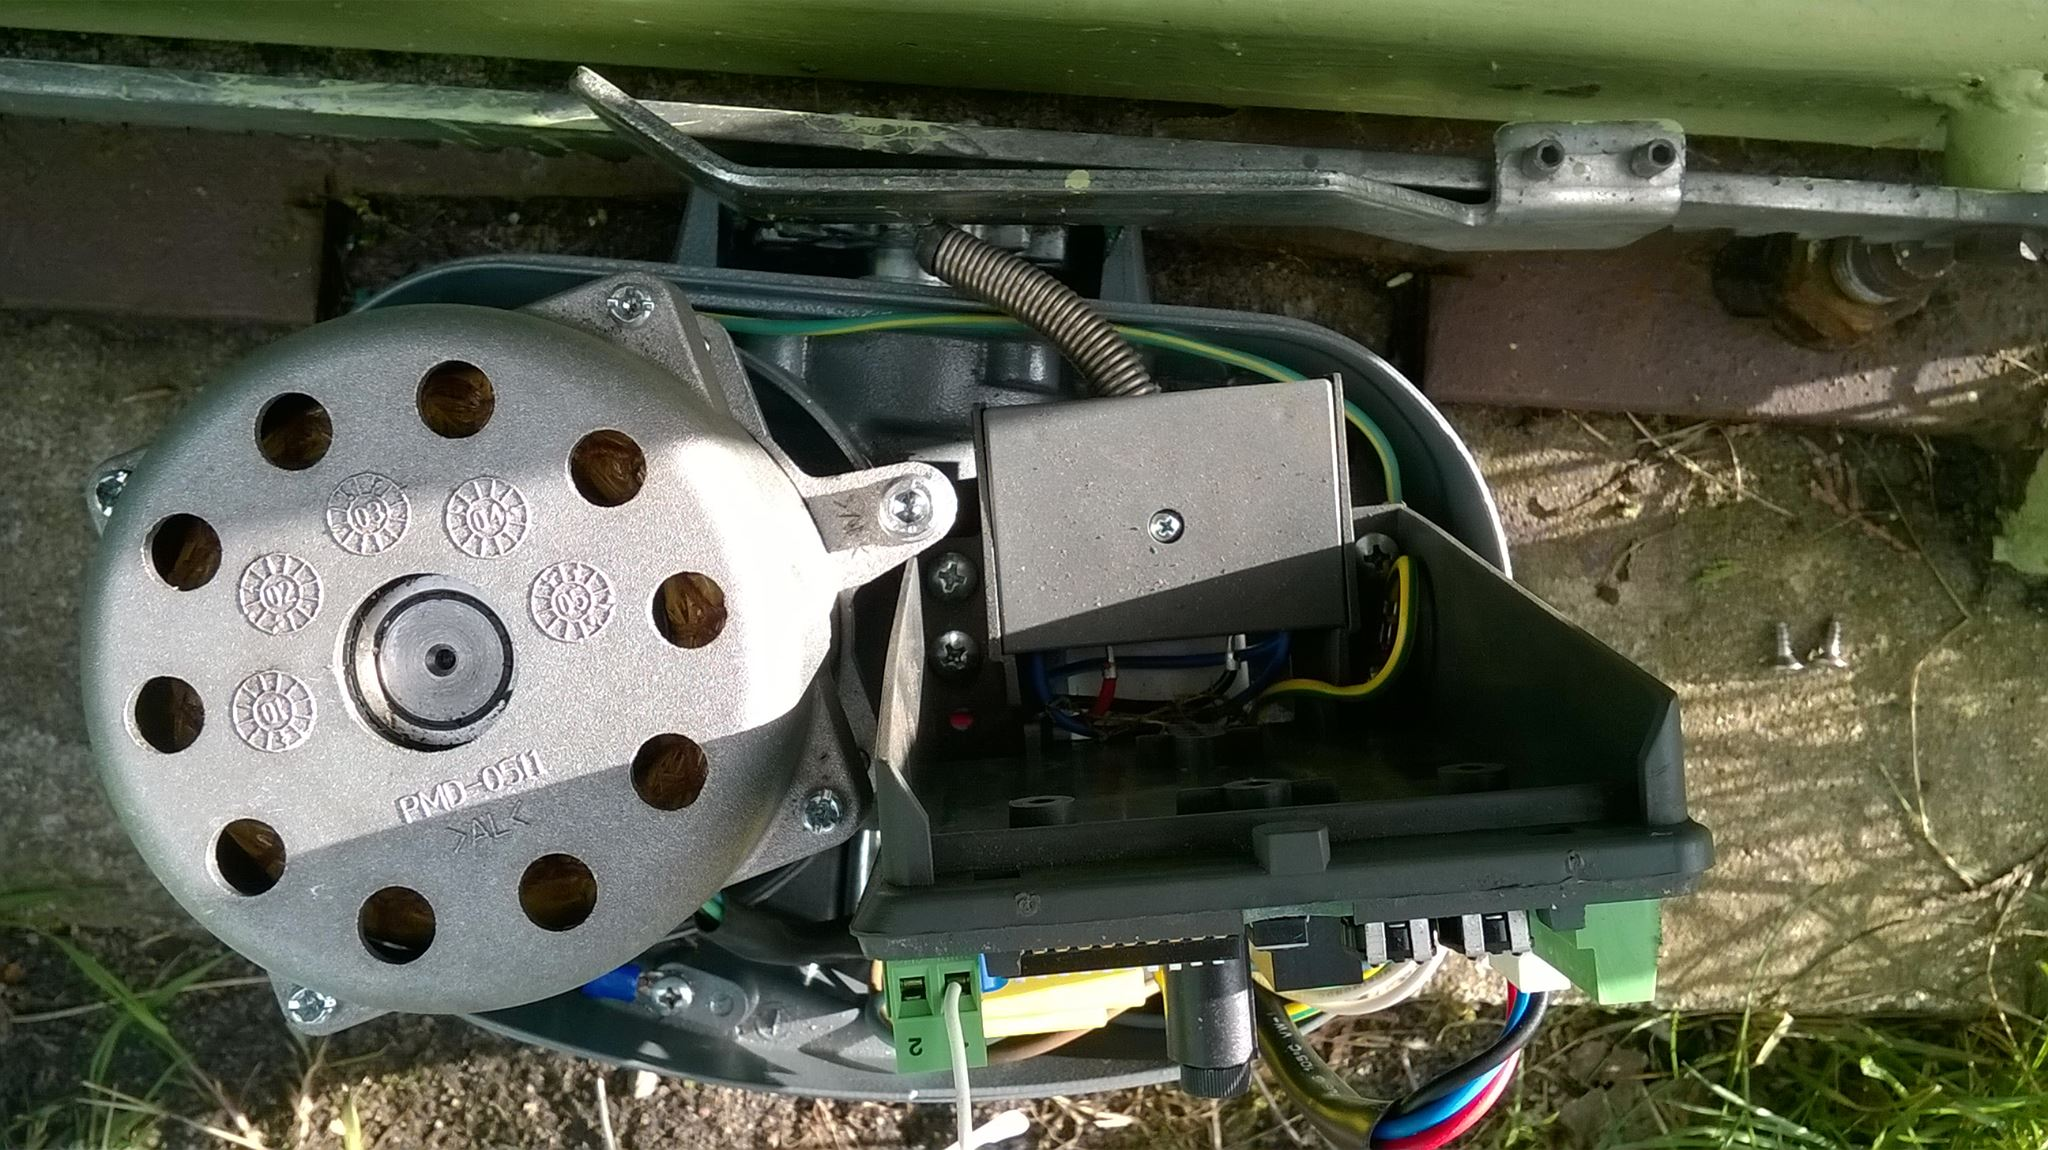 Nice RO300 - Piloty zaprogramowane, motoreduktor nie startuje.